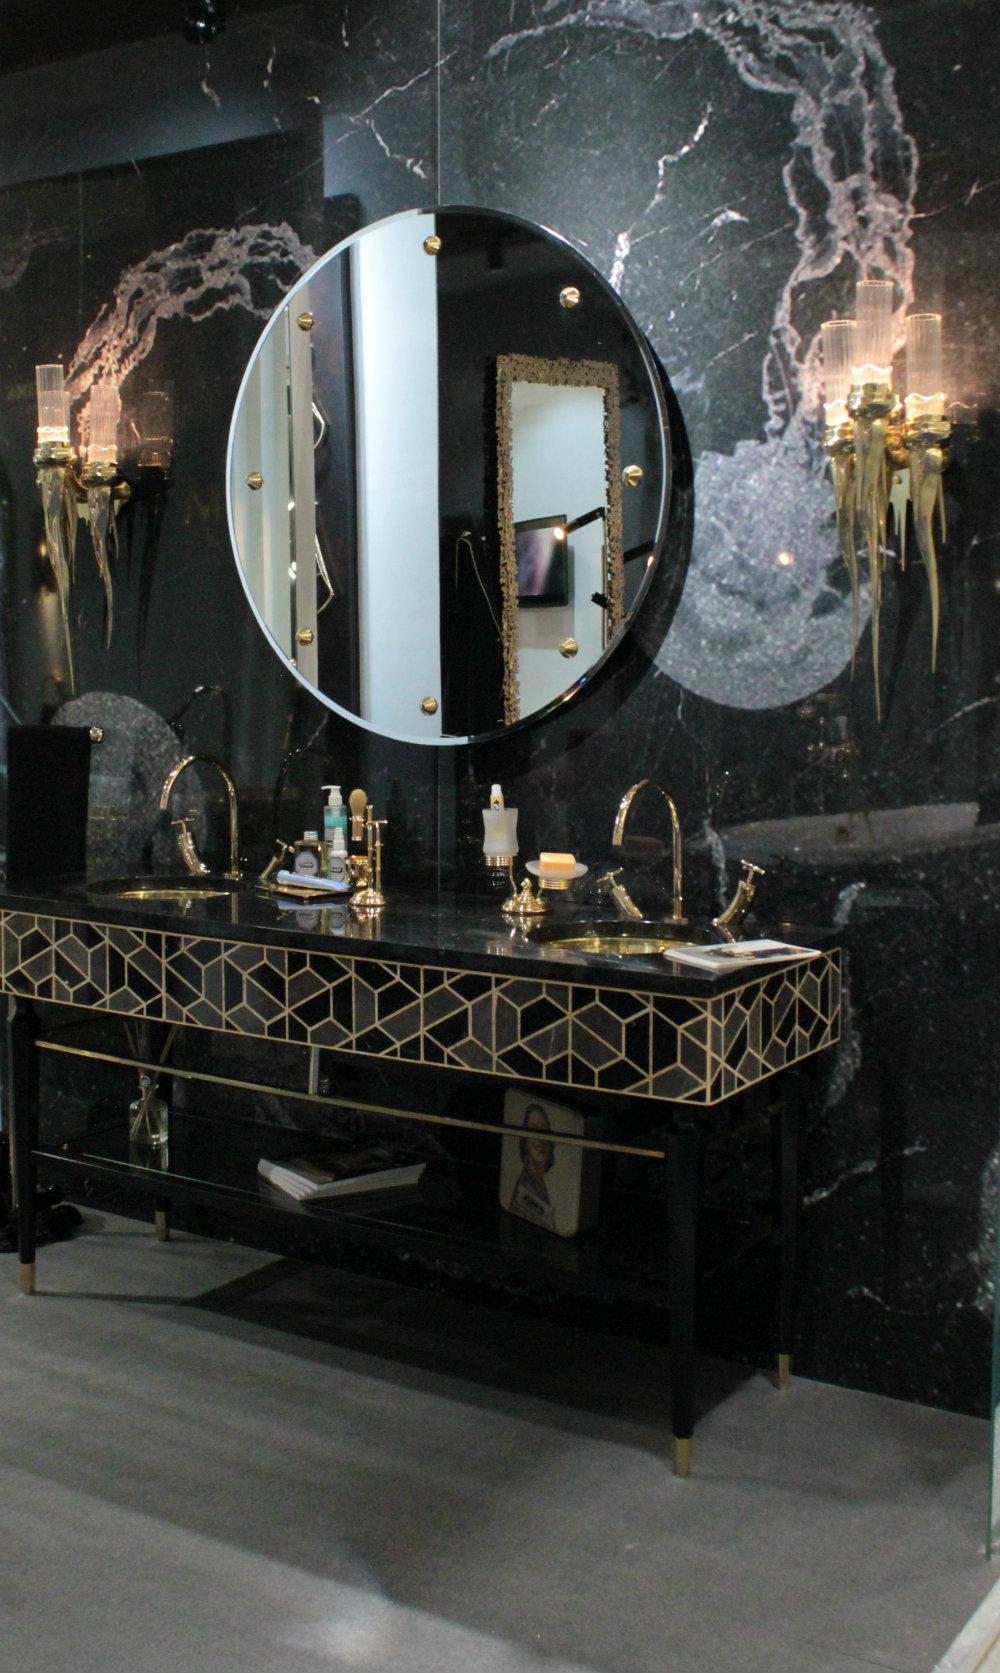 Cersaie 2019: Luxury Lighting For Your Bathroom